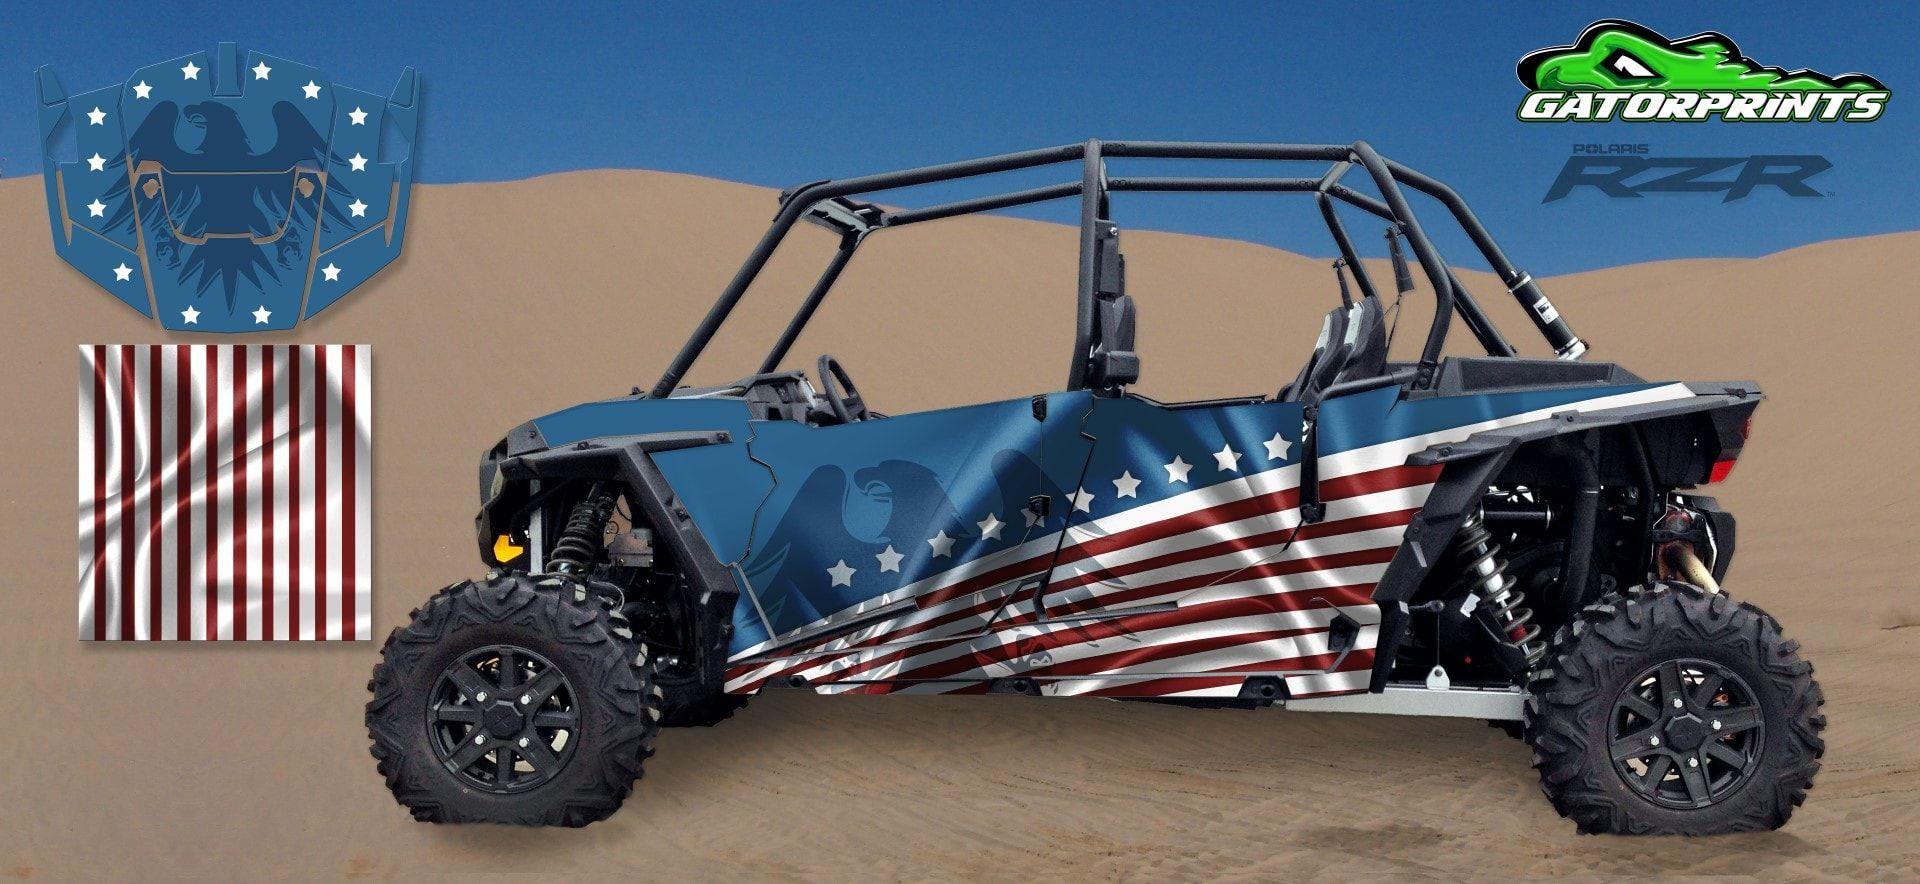 The Patriot Rzr Rzr 1000 4 Seater Custom Decals